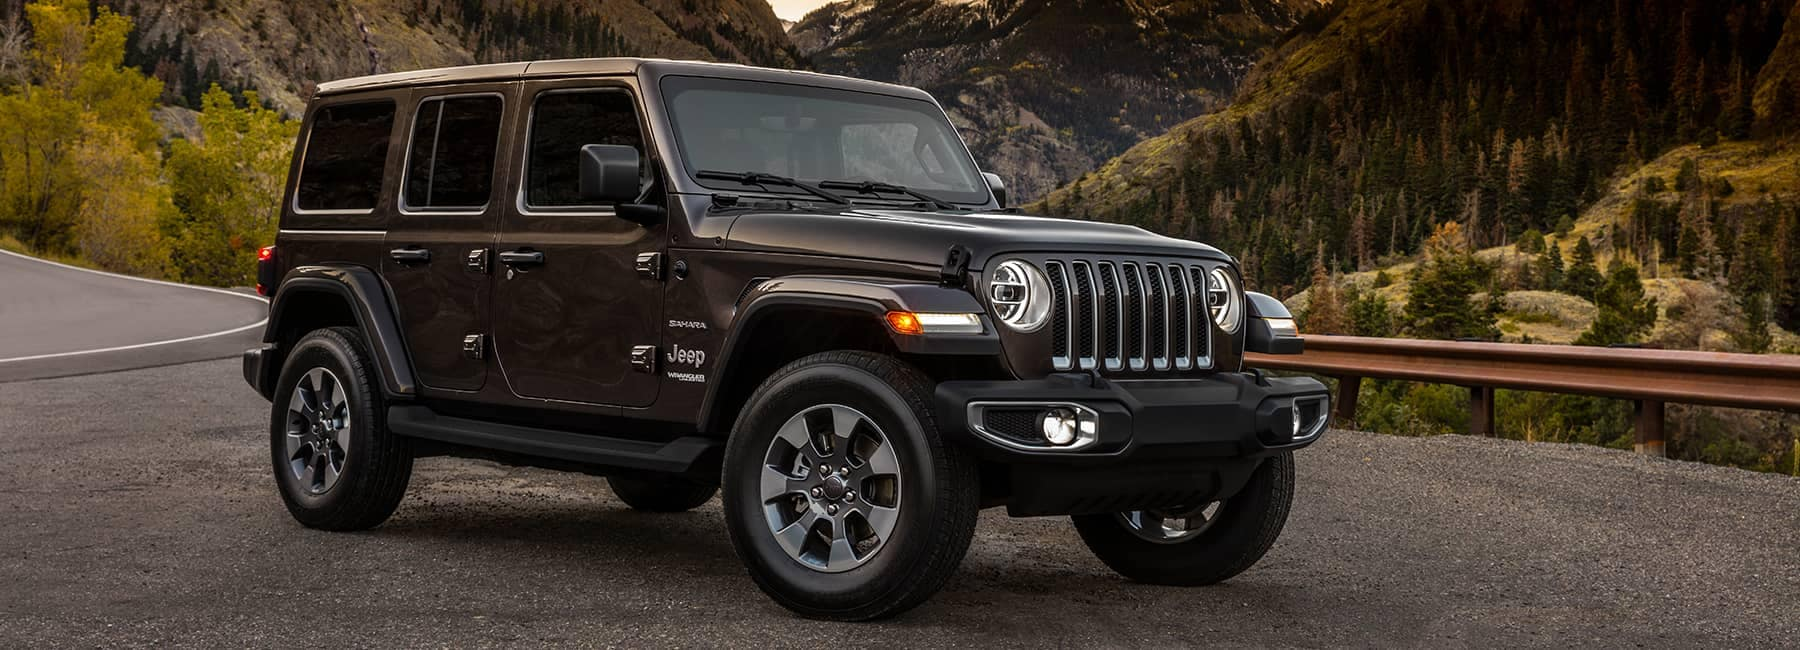 Sam Leman Bloomington >> Sam Leman Chrysler Jeep Dodge Dealer In Bloomington Il